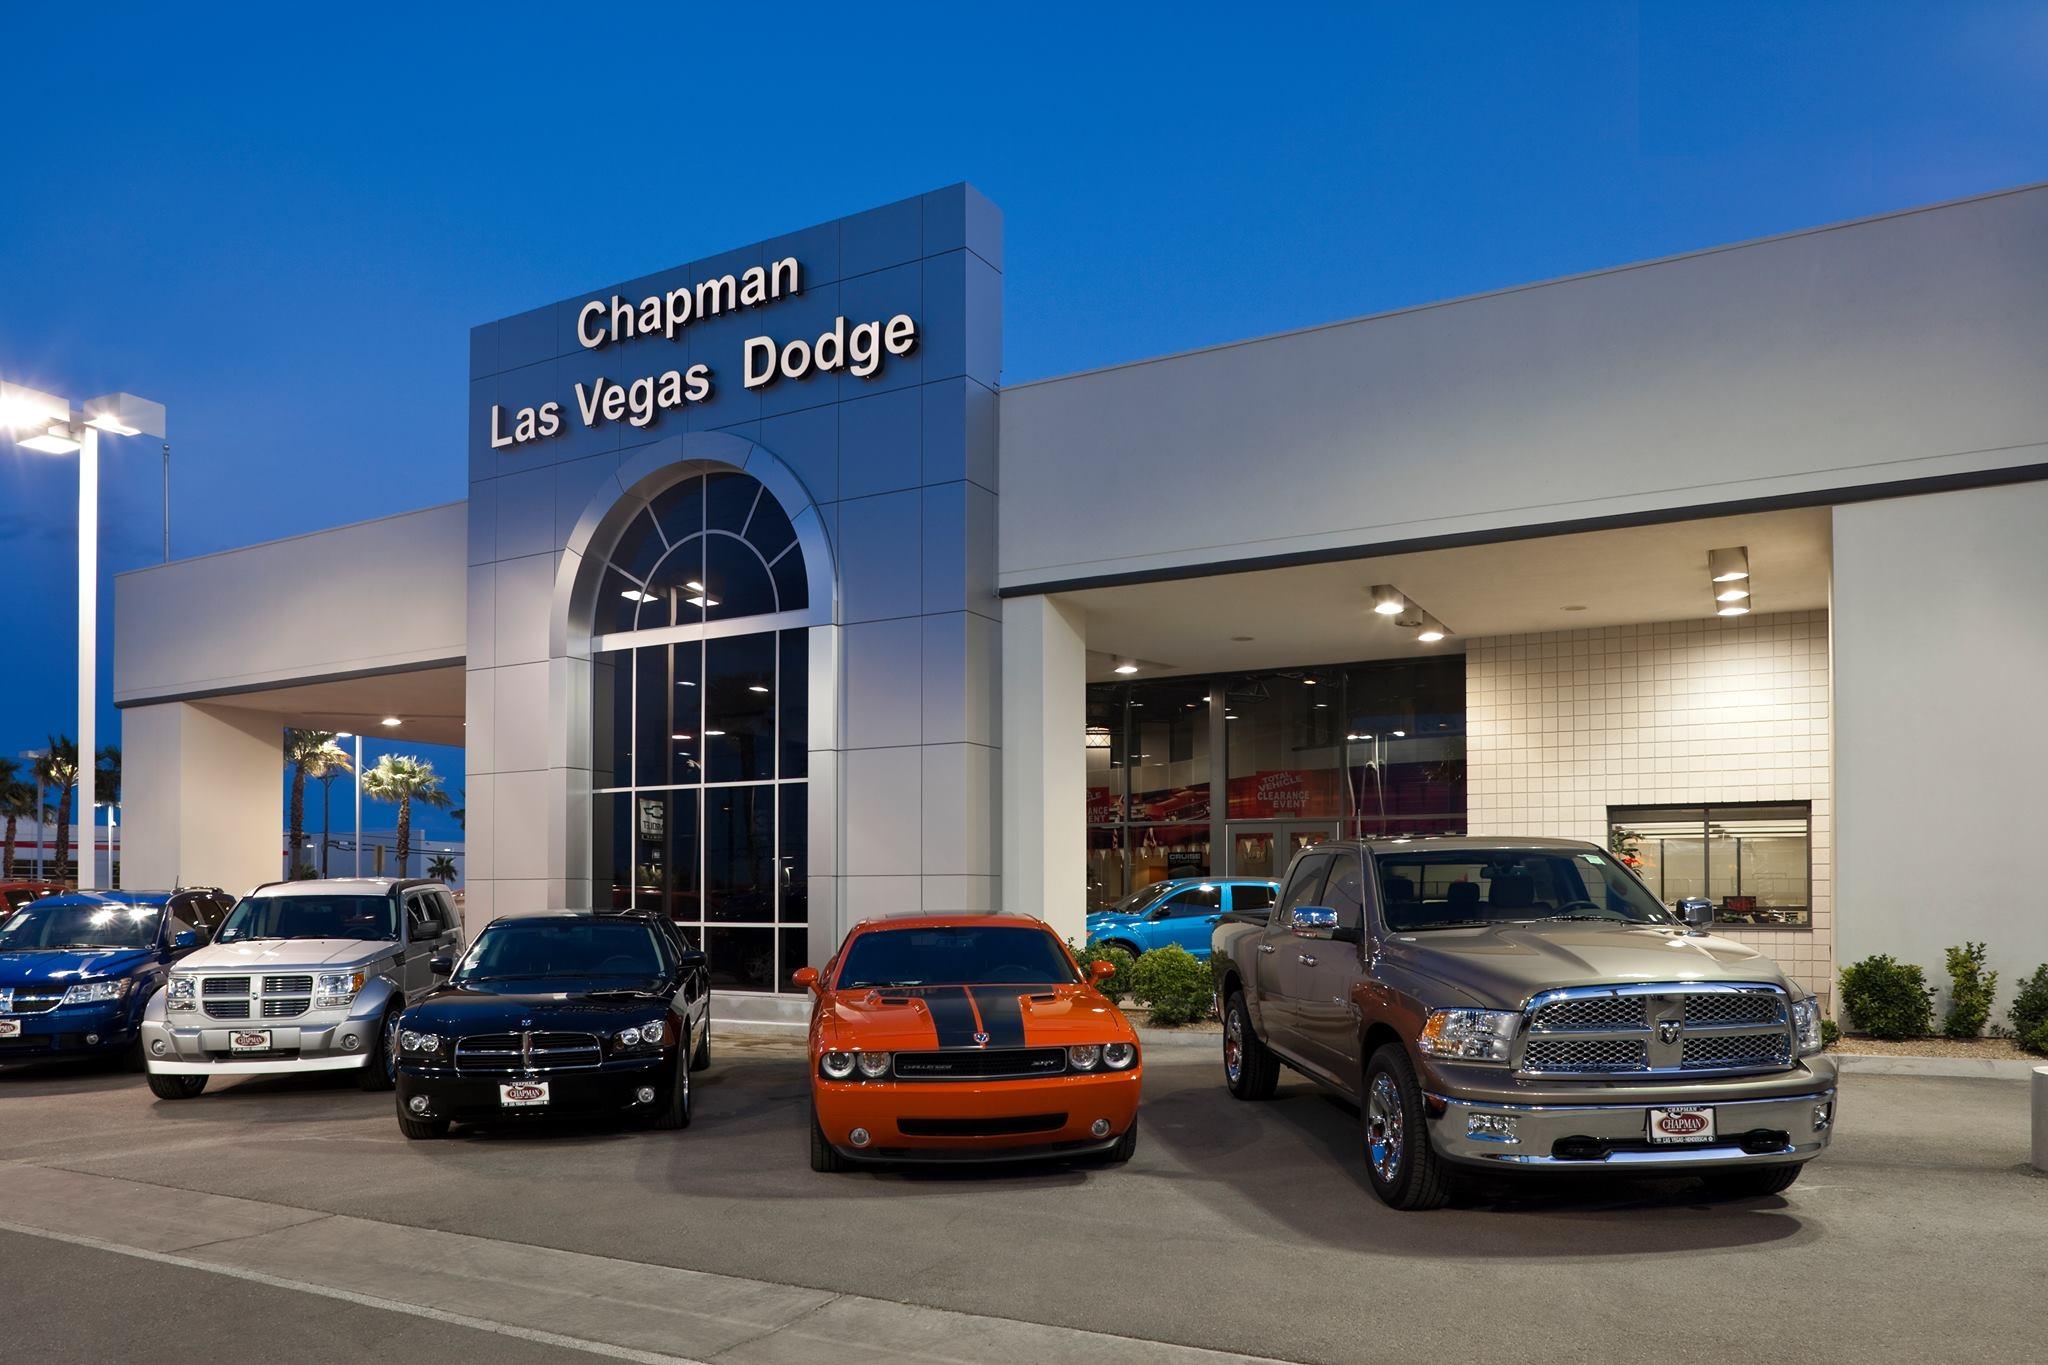 Chapman Las Vegas Dodge Chrysler Jeep Ram image 1